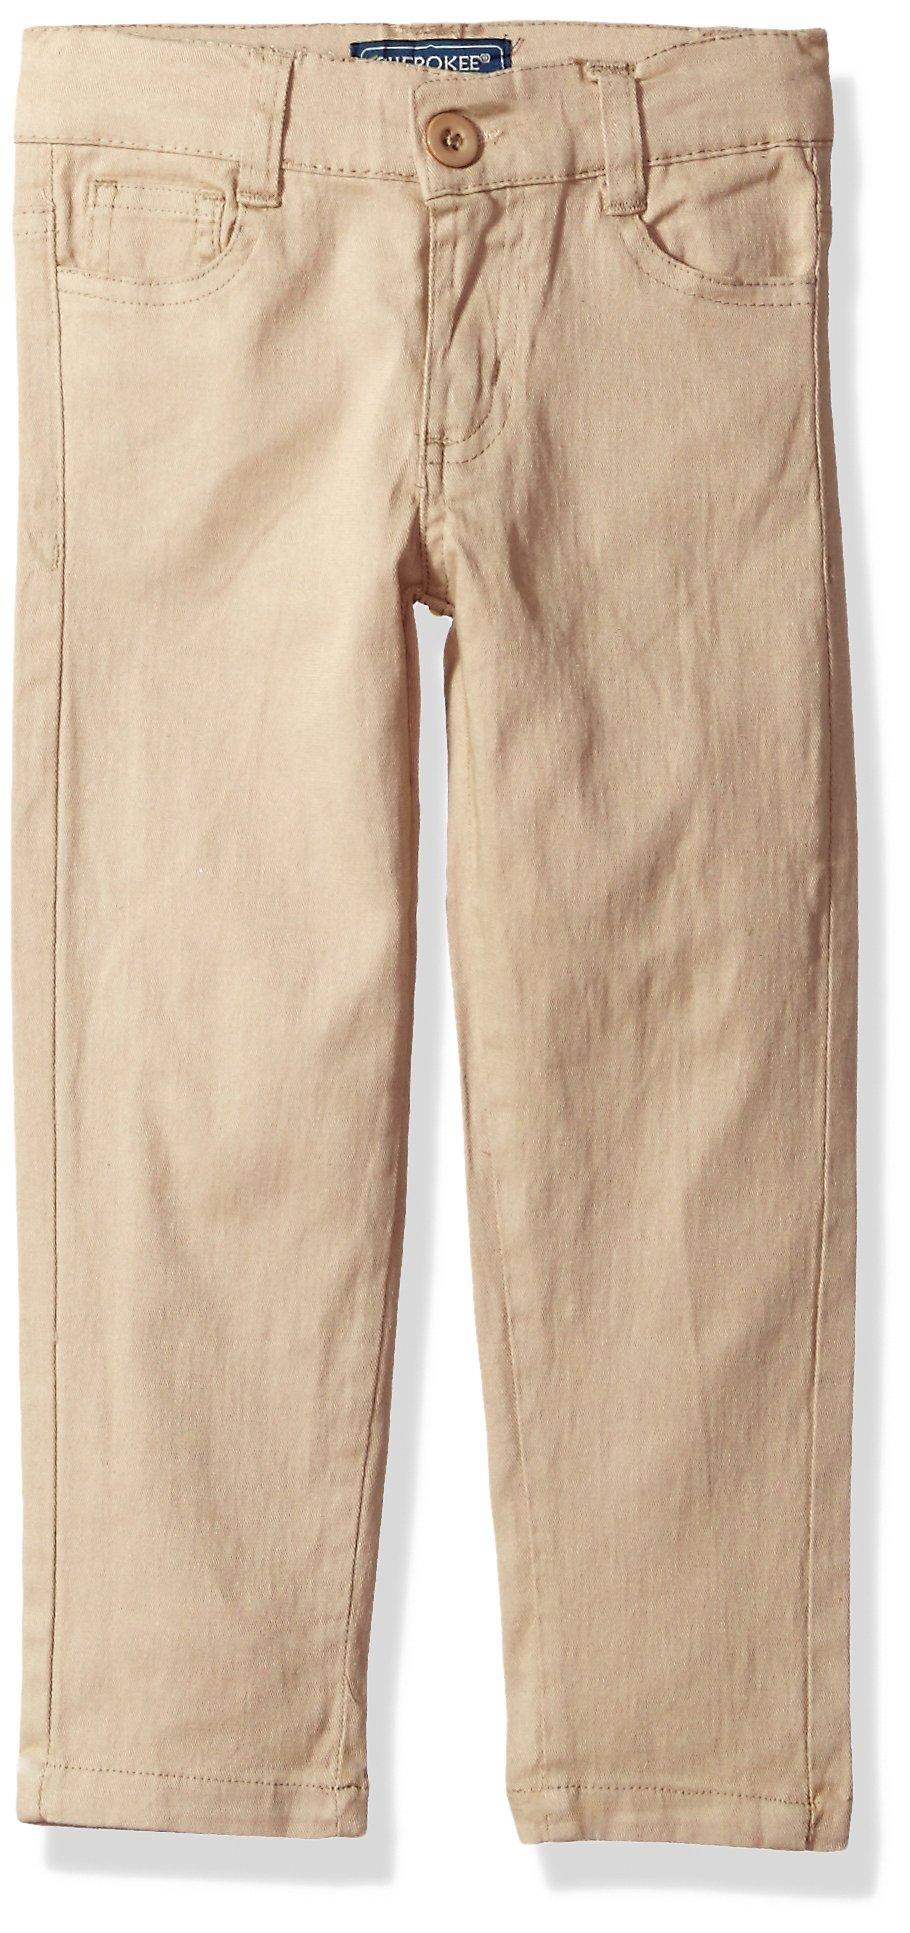 Cherokee Big Girls' Uniform Stretch Twill Skinny Pant, Khaki 5 Pocket, 7